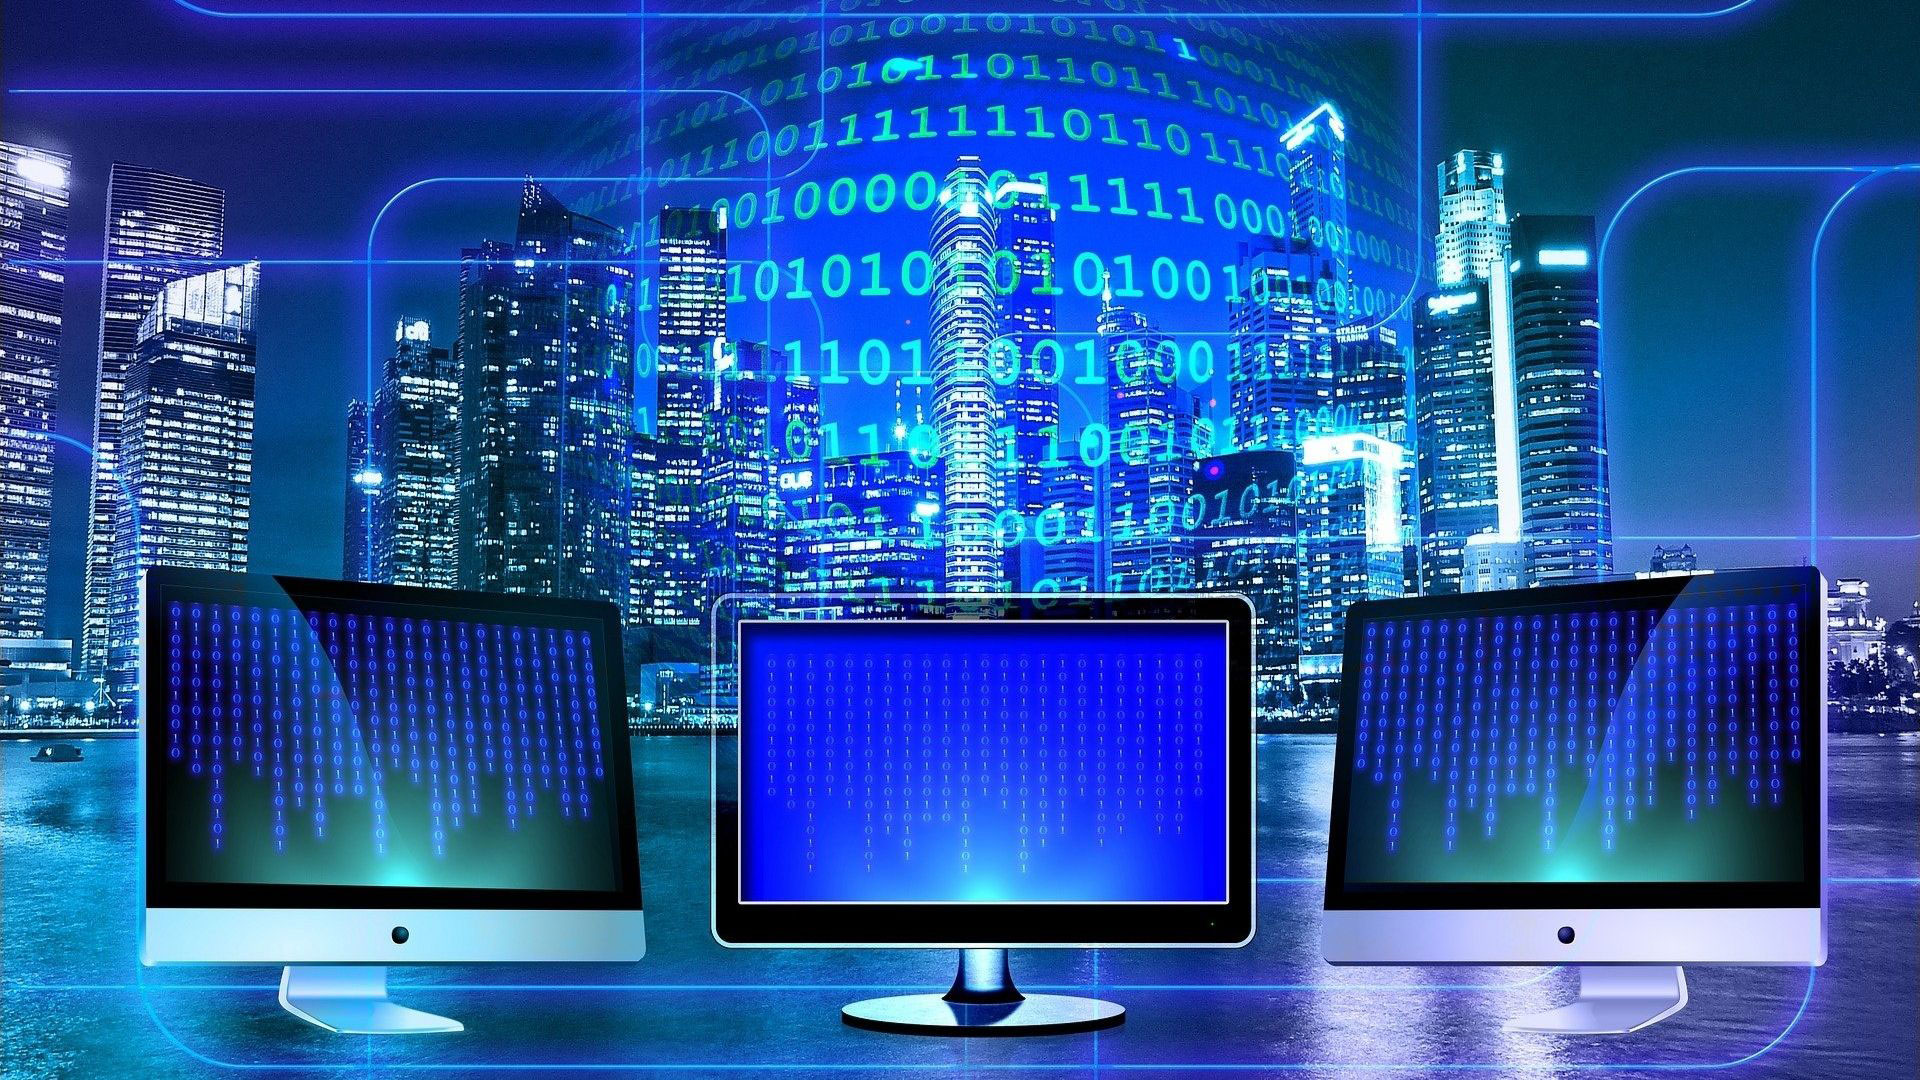 Episode-268-Technology-The-Internet